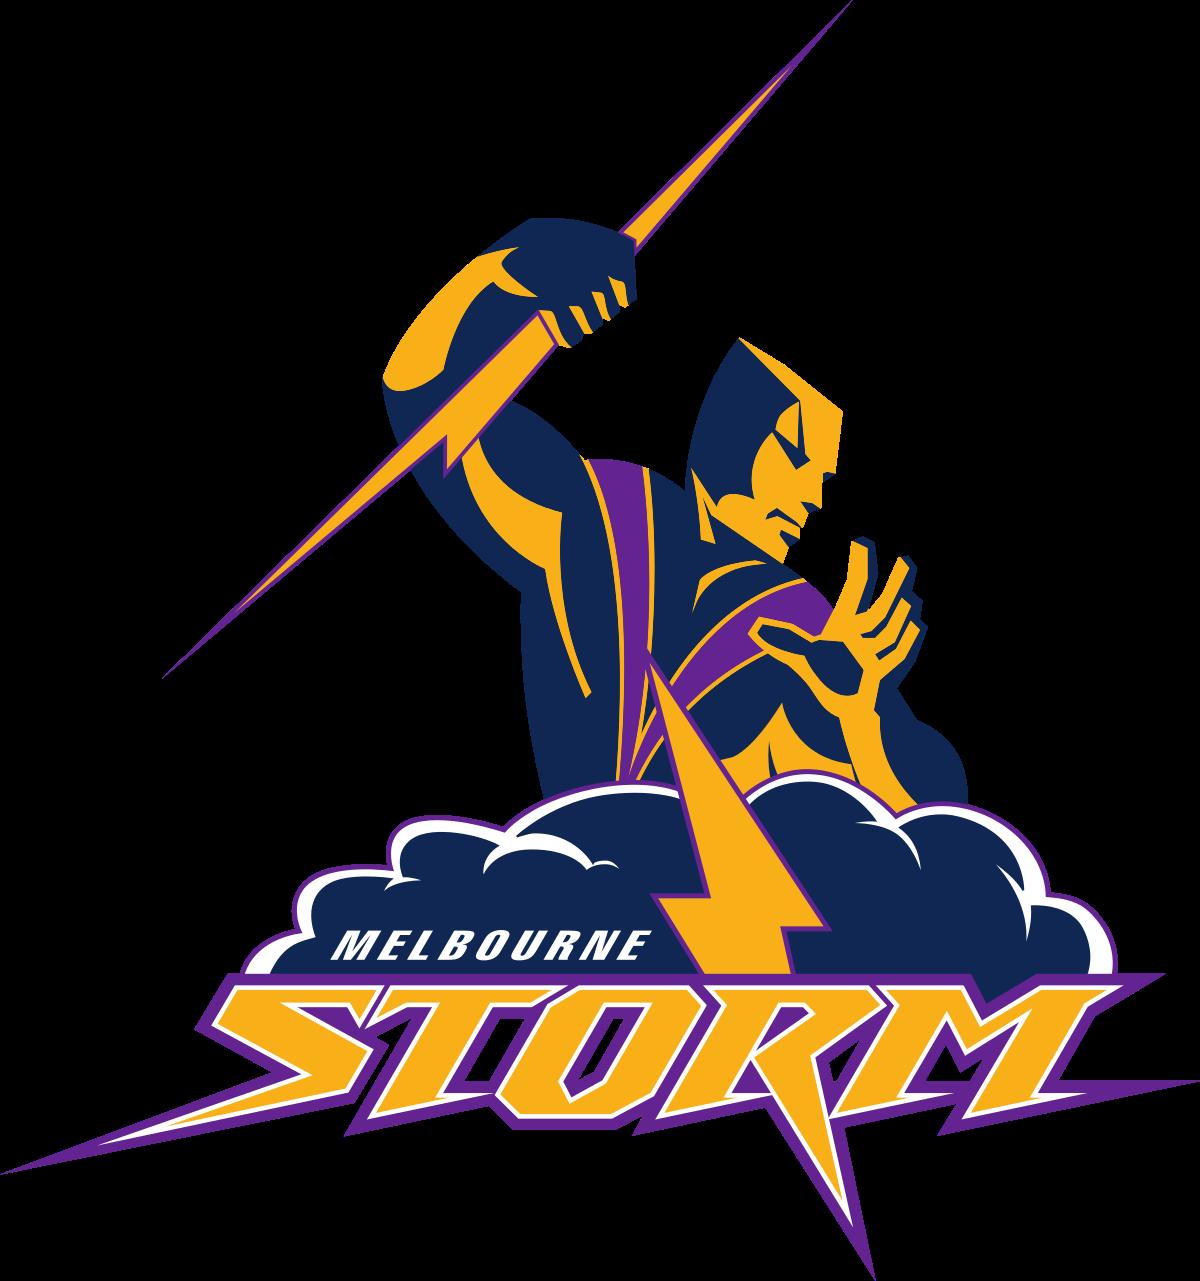 Hurricane clipart hurrican. Melbourne storm wikipedia